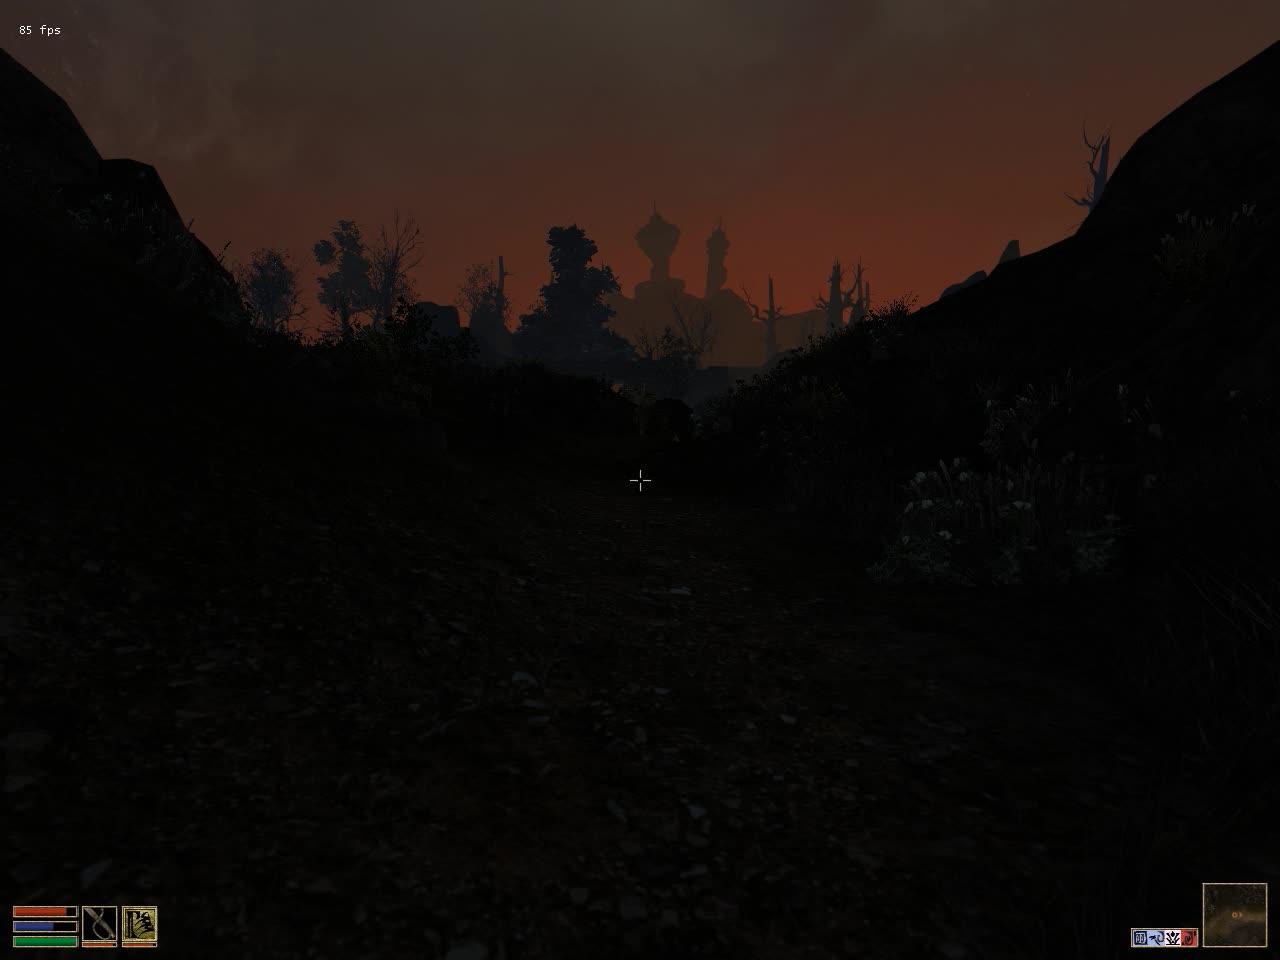 Morrowind horrible walking speed GIFs